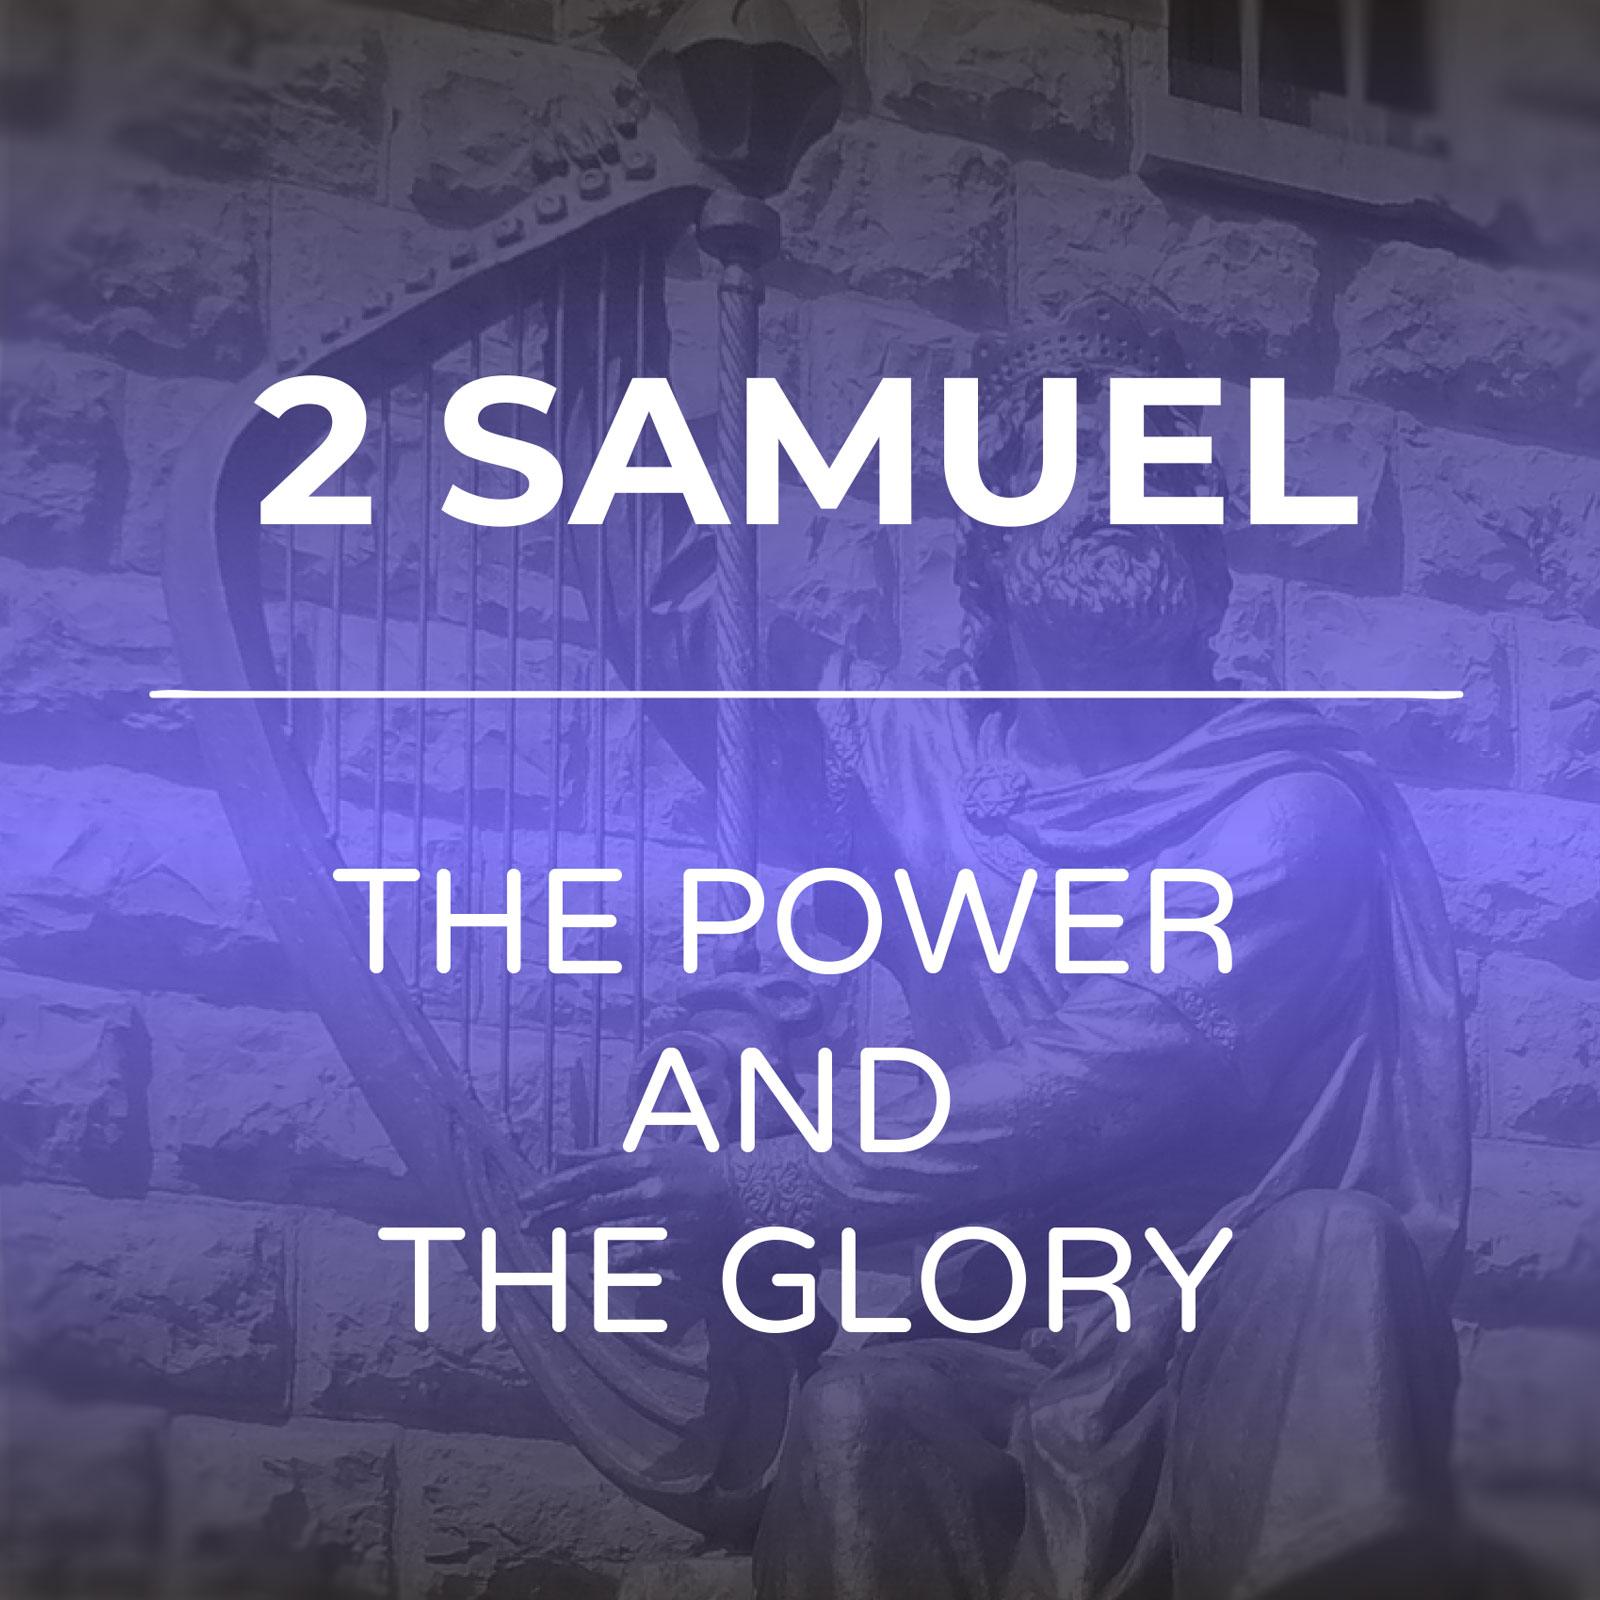 2 Samuel - The Power And The Glory Sermon Series - Hope Church Huddersfield